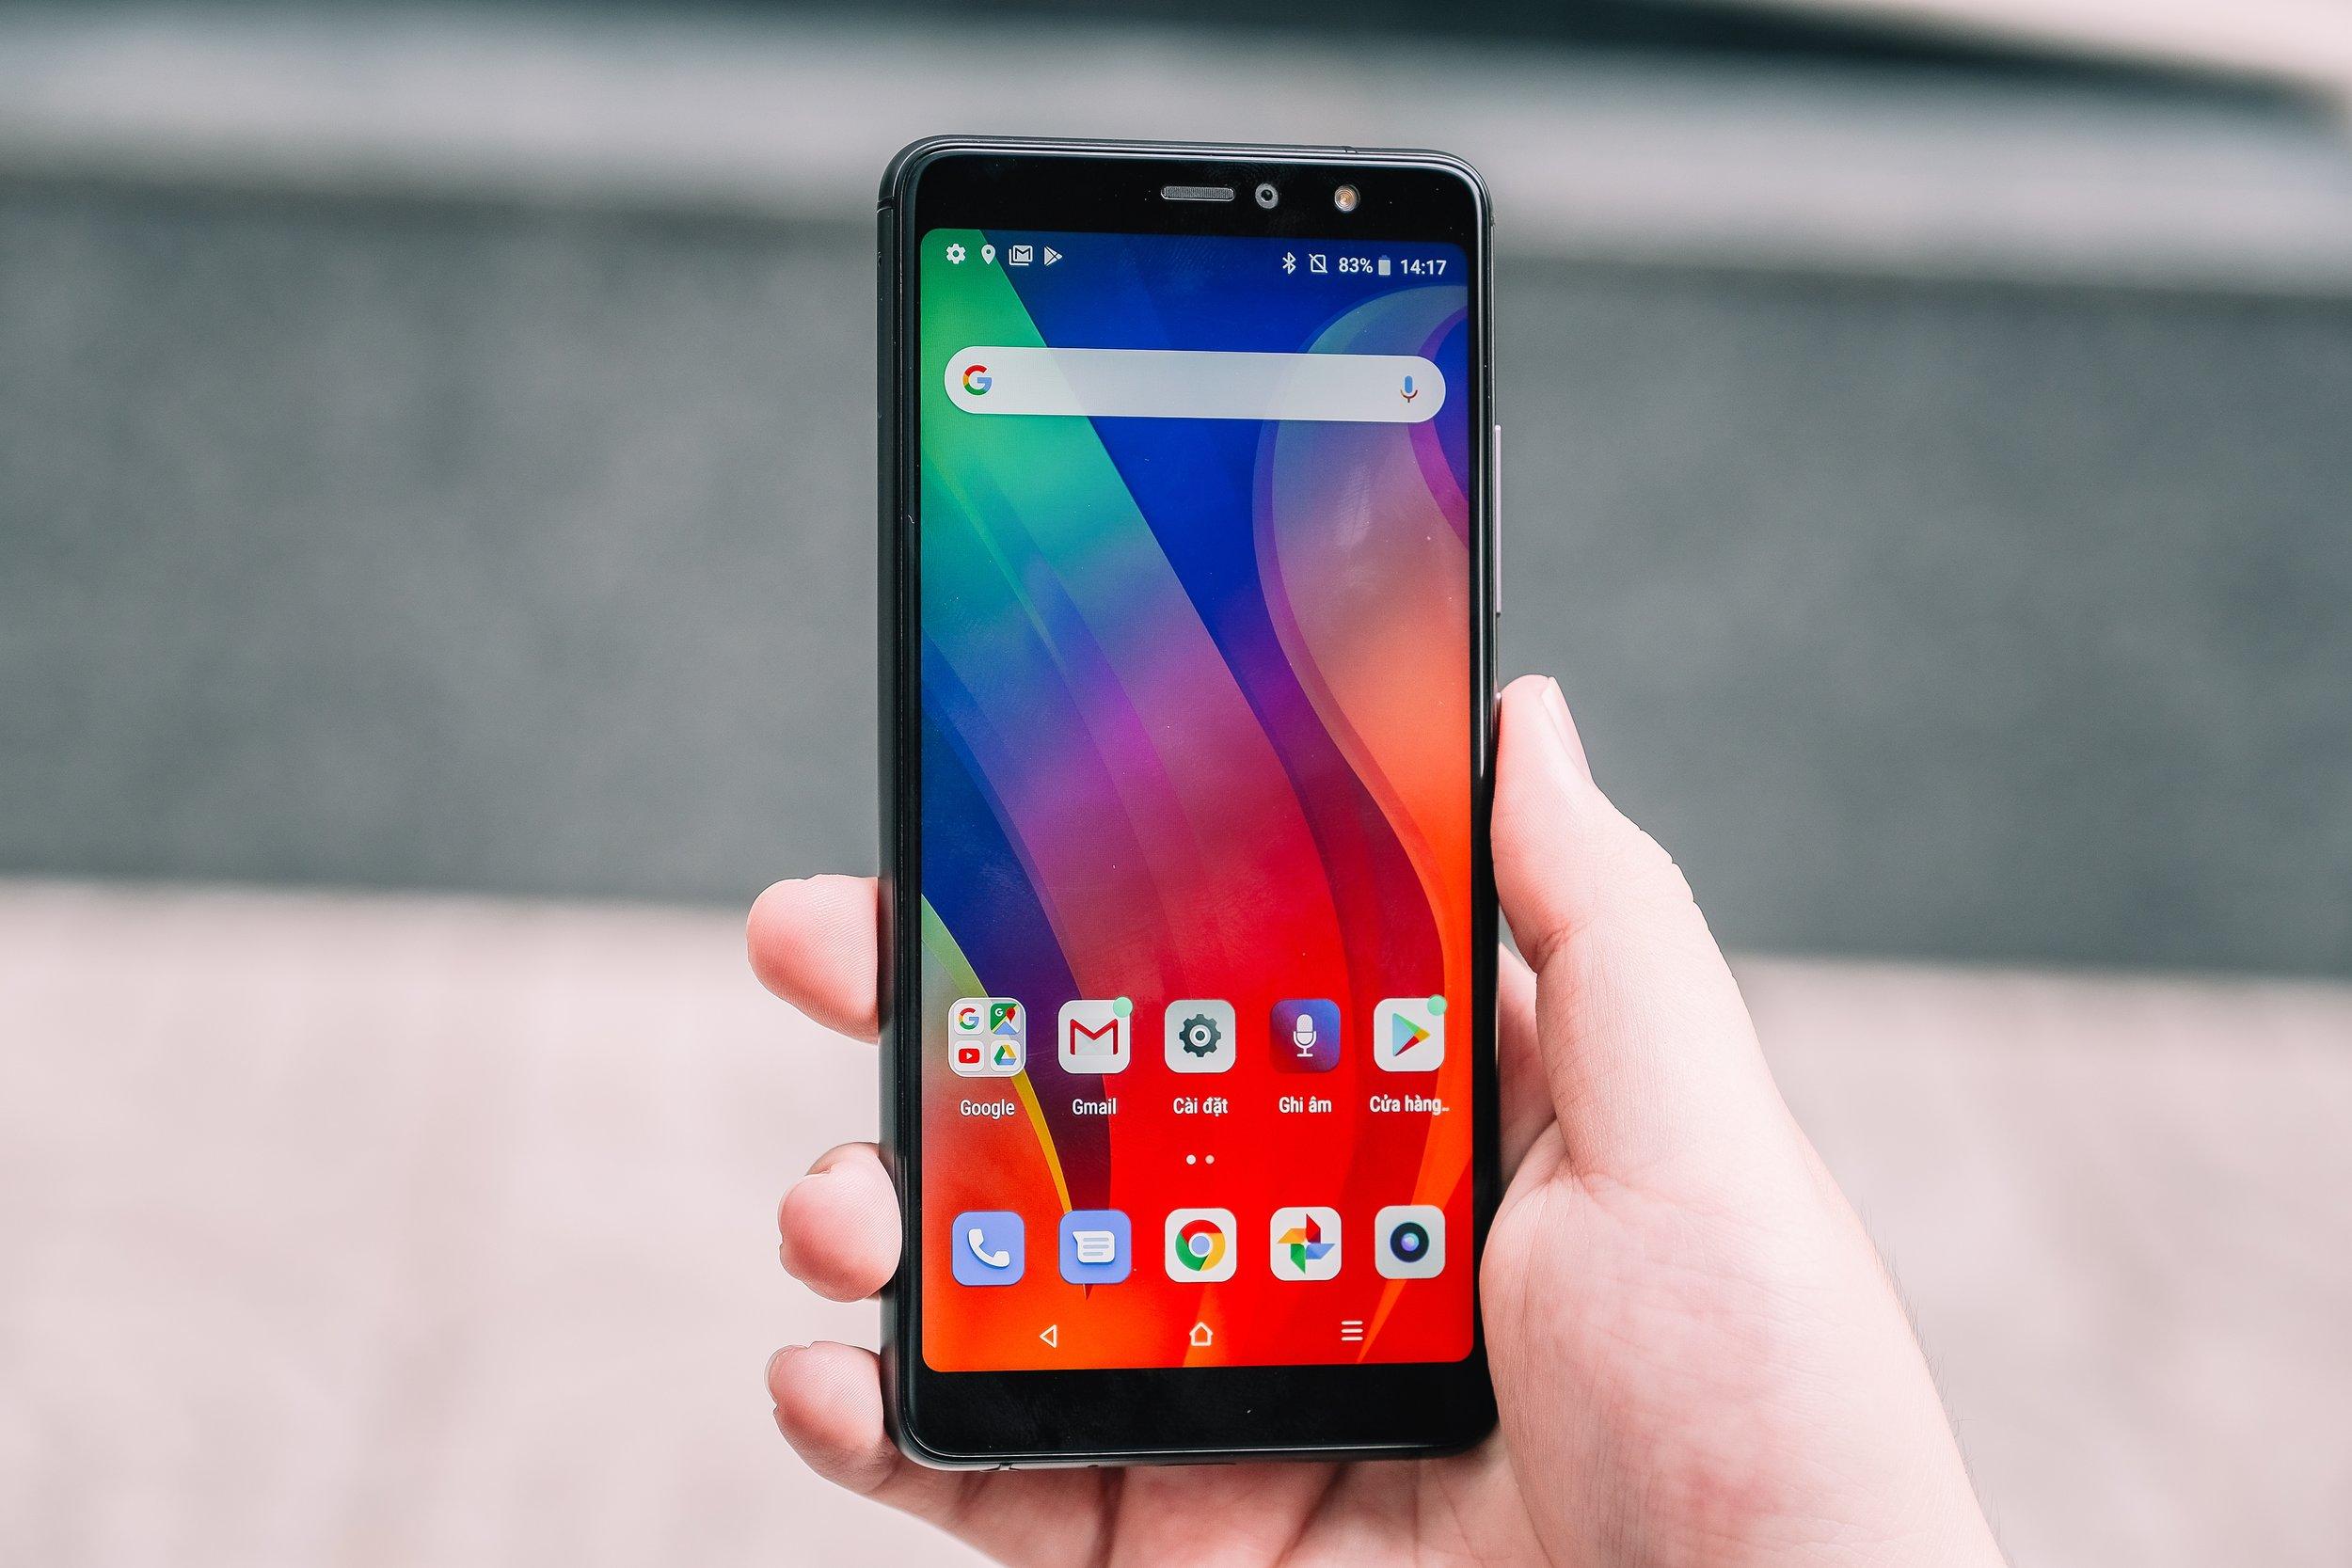 ANDROID - Per scaricare l'app per Android (smartphone), clicca qui